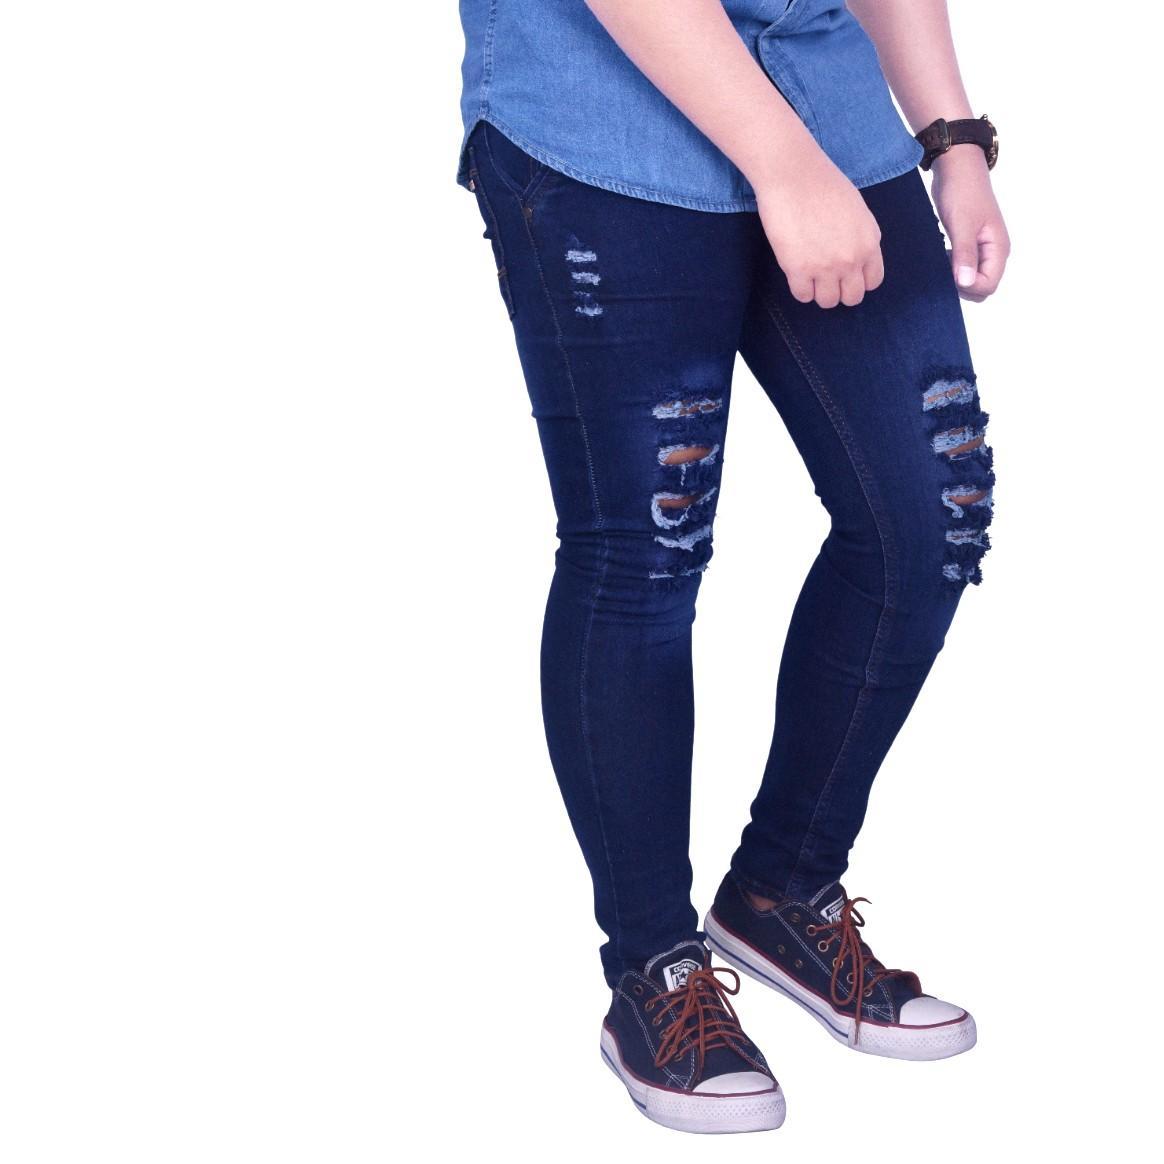 Dgm_Fashion1 Celana Jeans Sobek Panjang Denim /Celana lepis/Celana Jeans Skinny Pria/Celana Panjang/ Celana Pria/Celana Casual/celana denim/celana jeans hitam/jeans polos /CELANA JEANS PENSIL JS 5832 5612